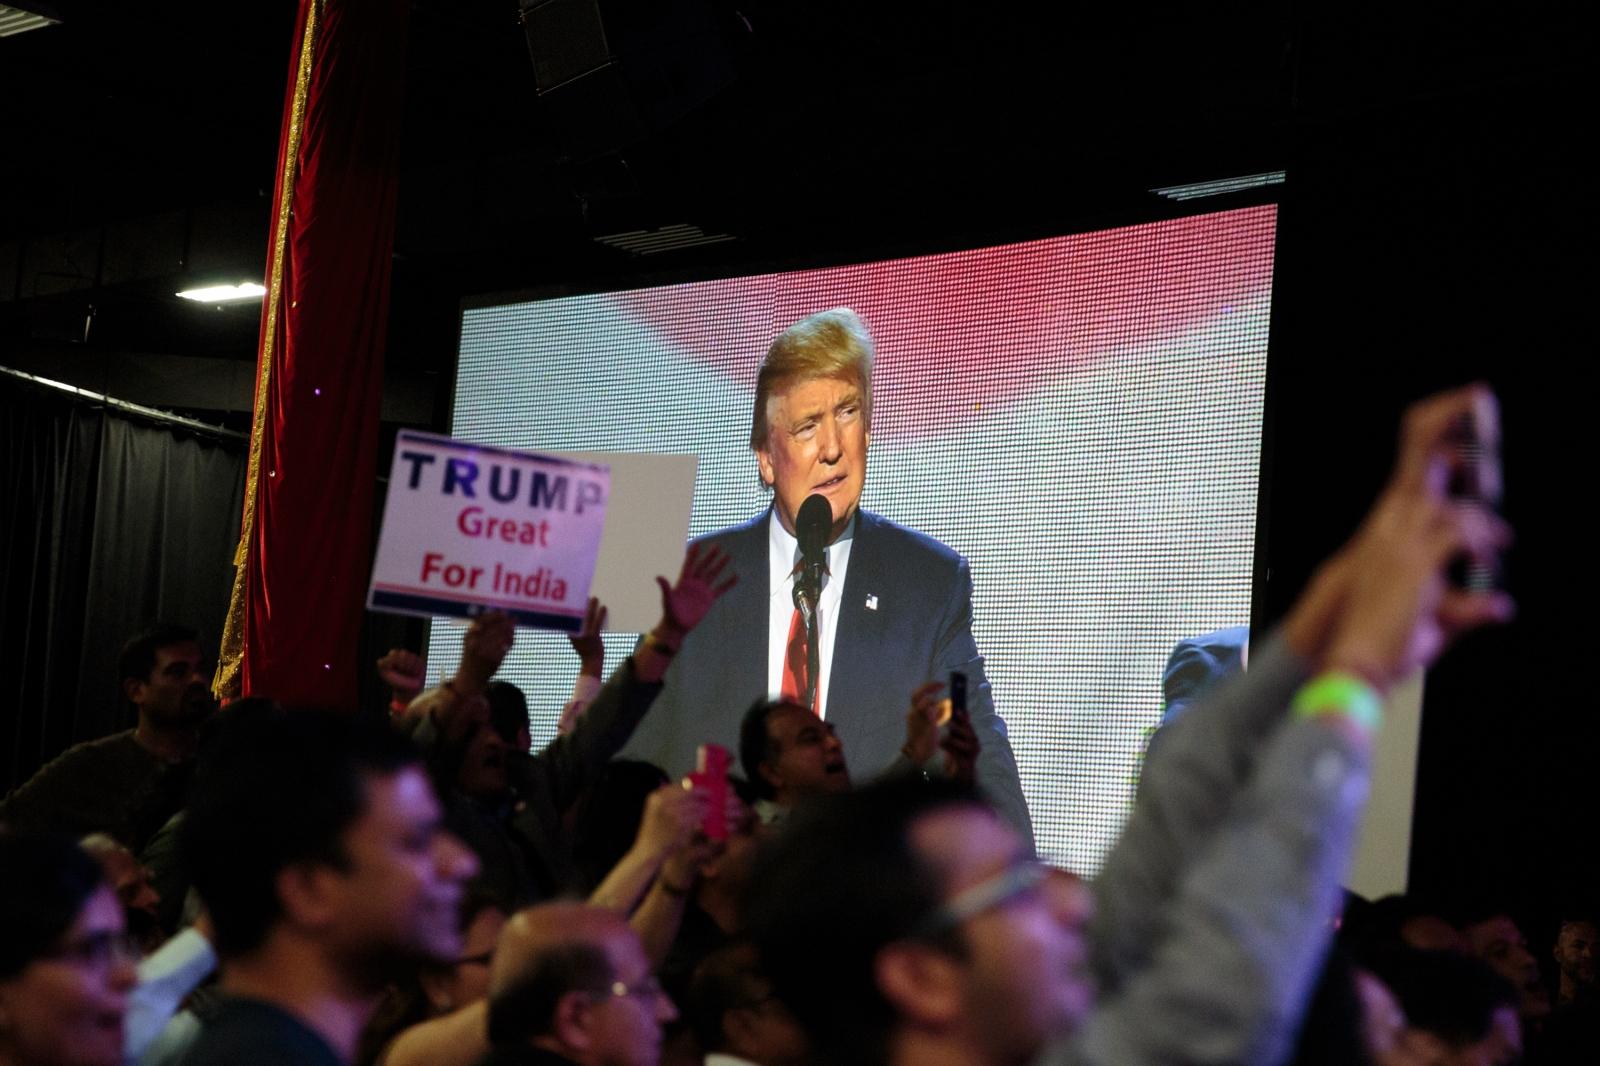 Slate Hindus for Trump